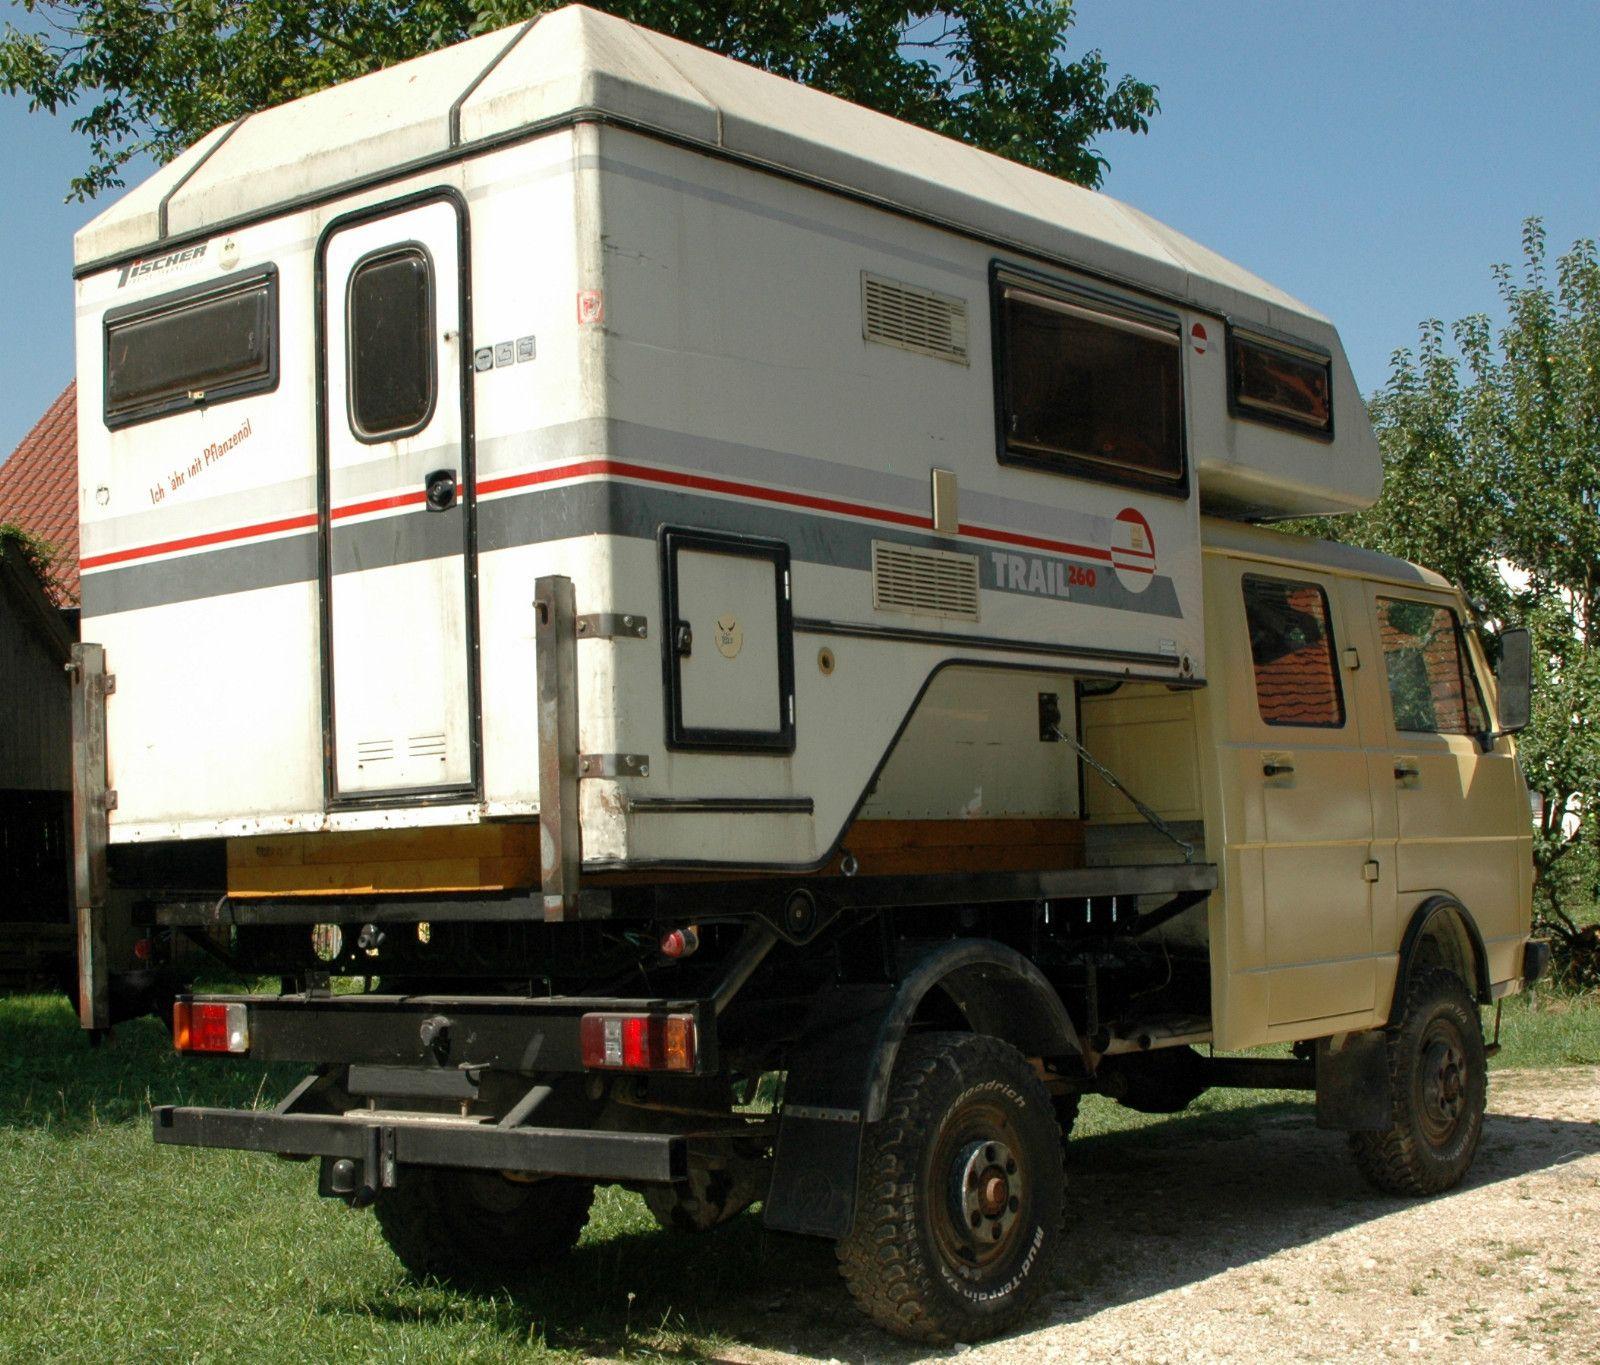 vw lt 45 allrad 2 4l td 80kw 3 5t zgg fernreisemobil 4x4. Black Bedroom Furniture Sets. Home Design Ideas